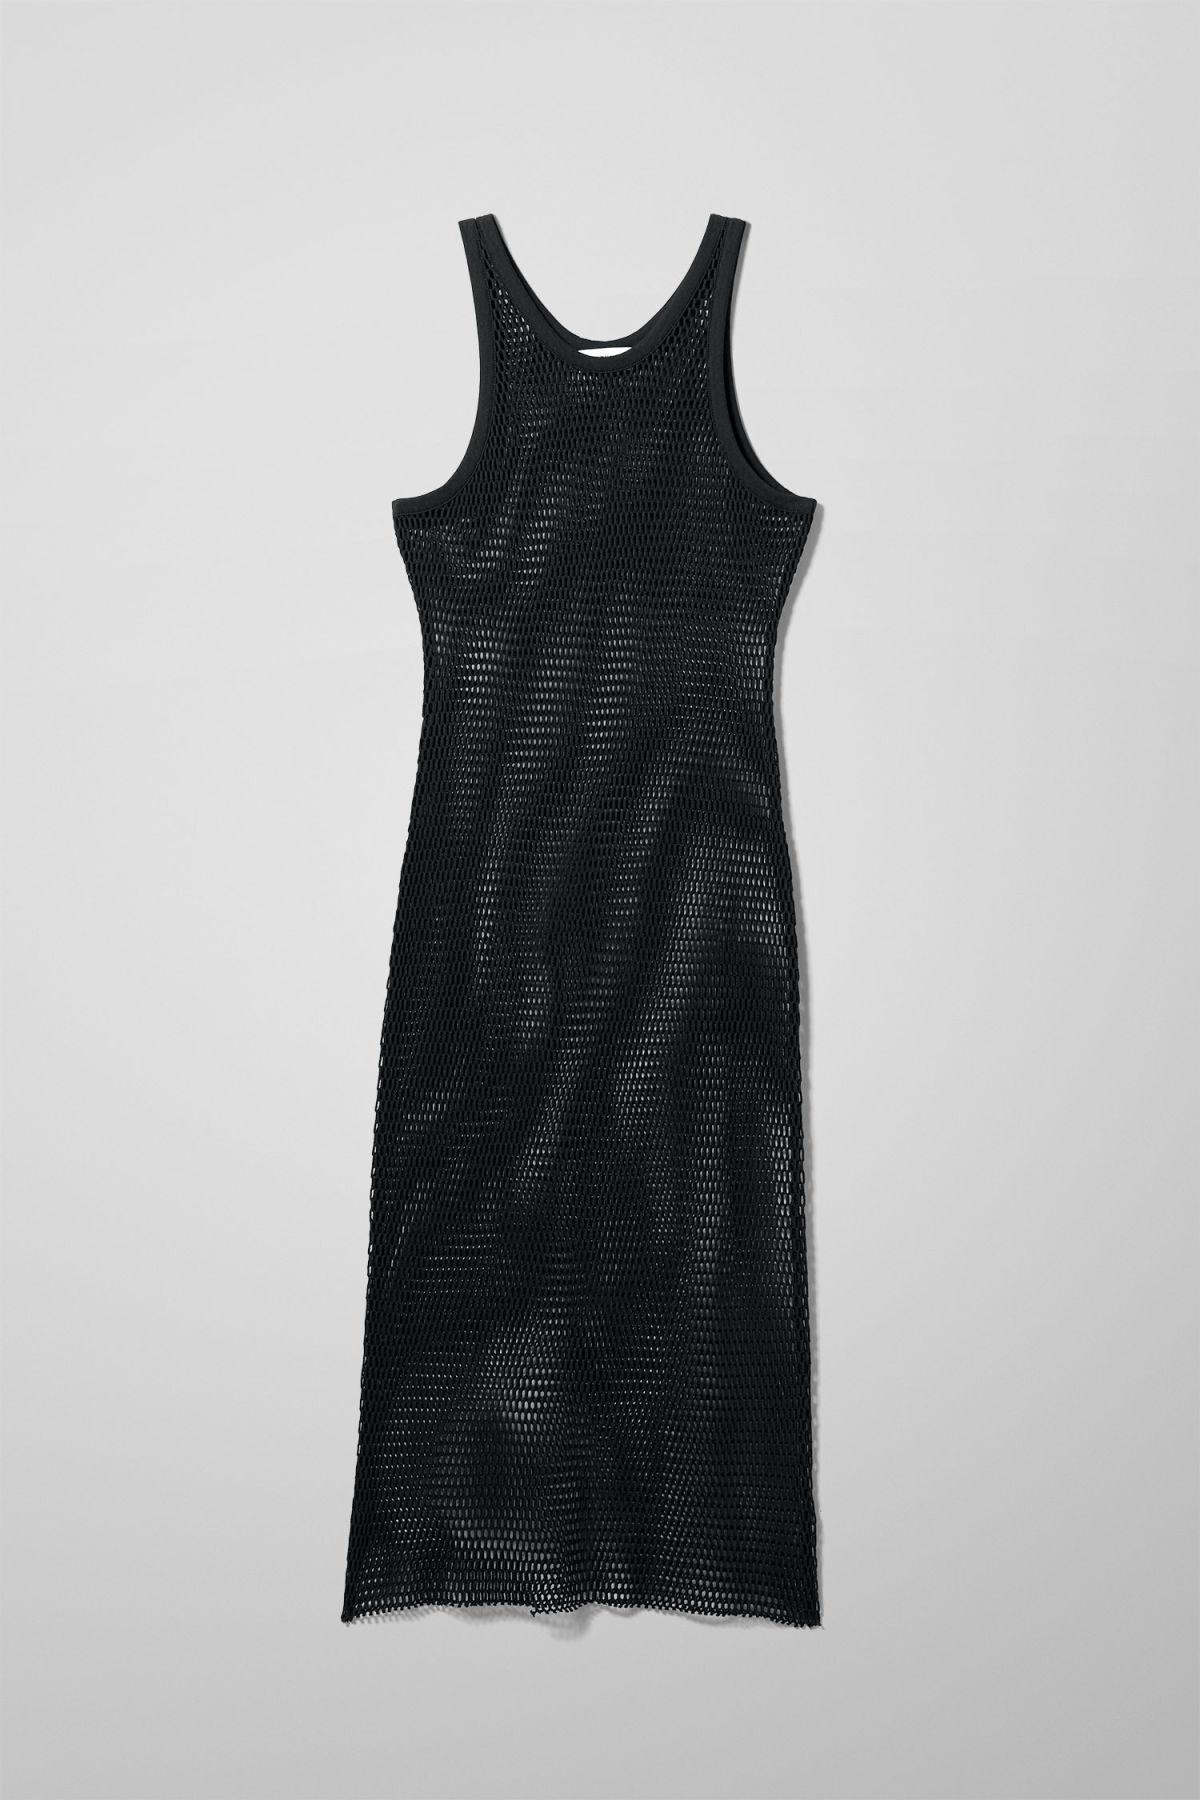 Image of Play Net Dress - Black-XS